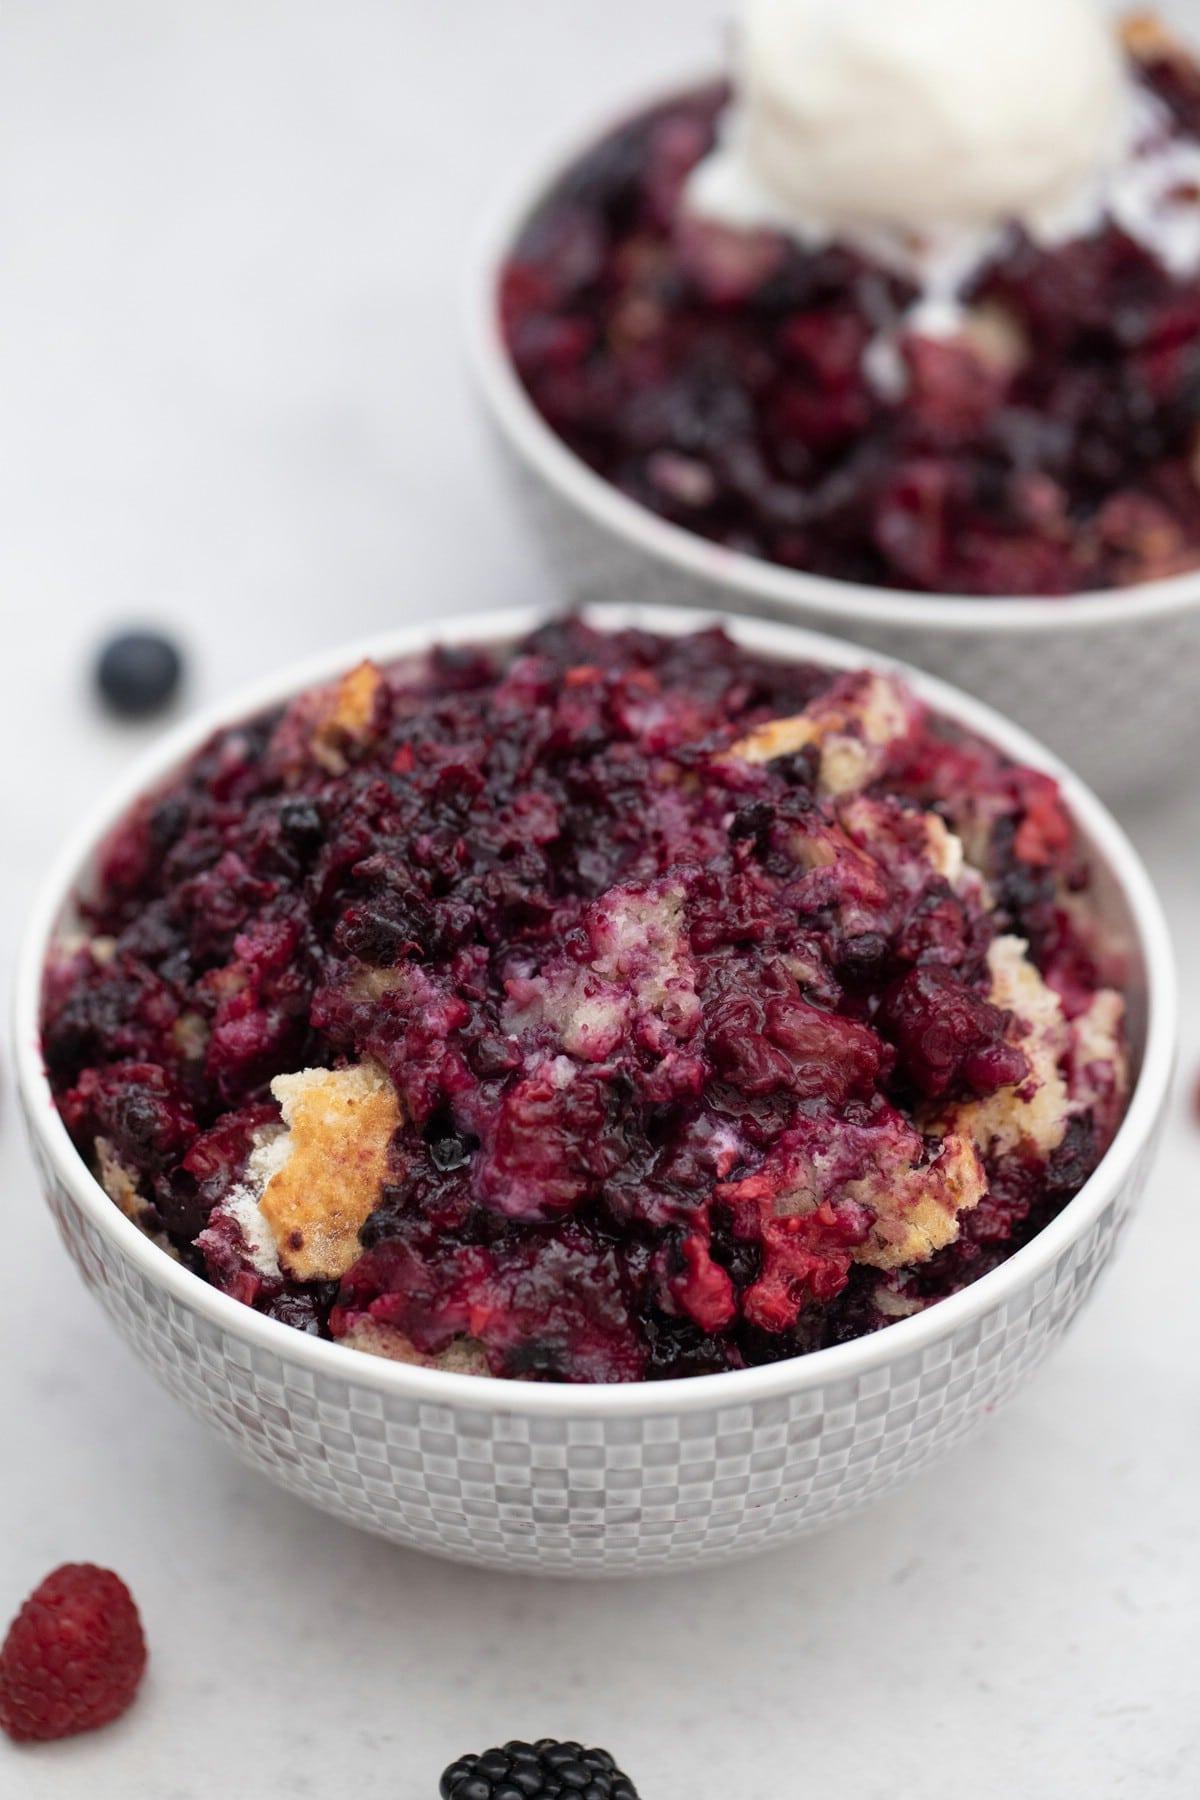 Bowls of berry cobbler